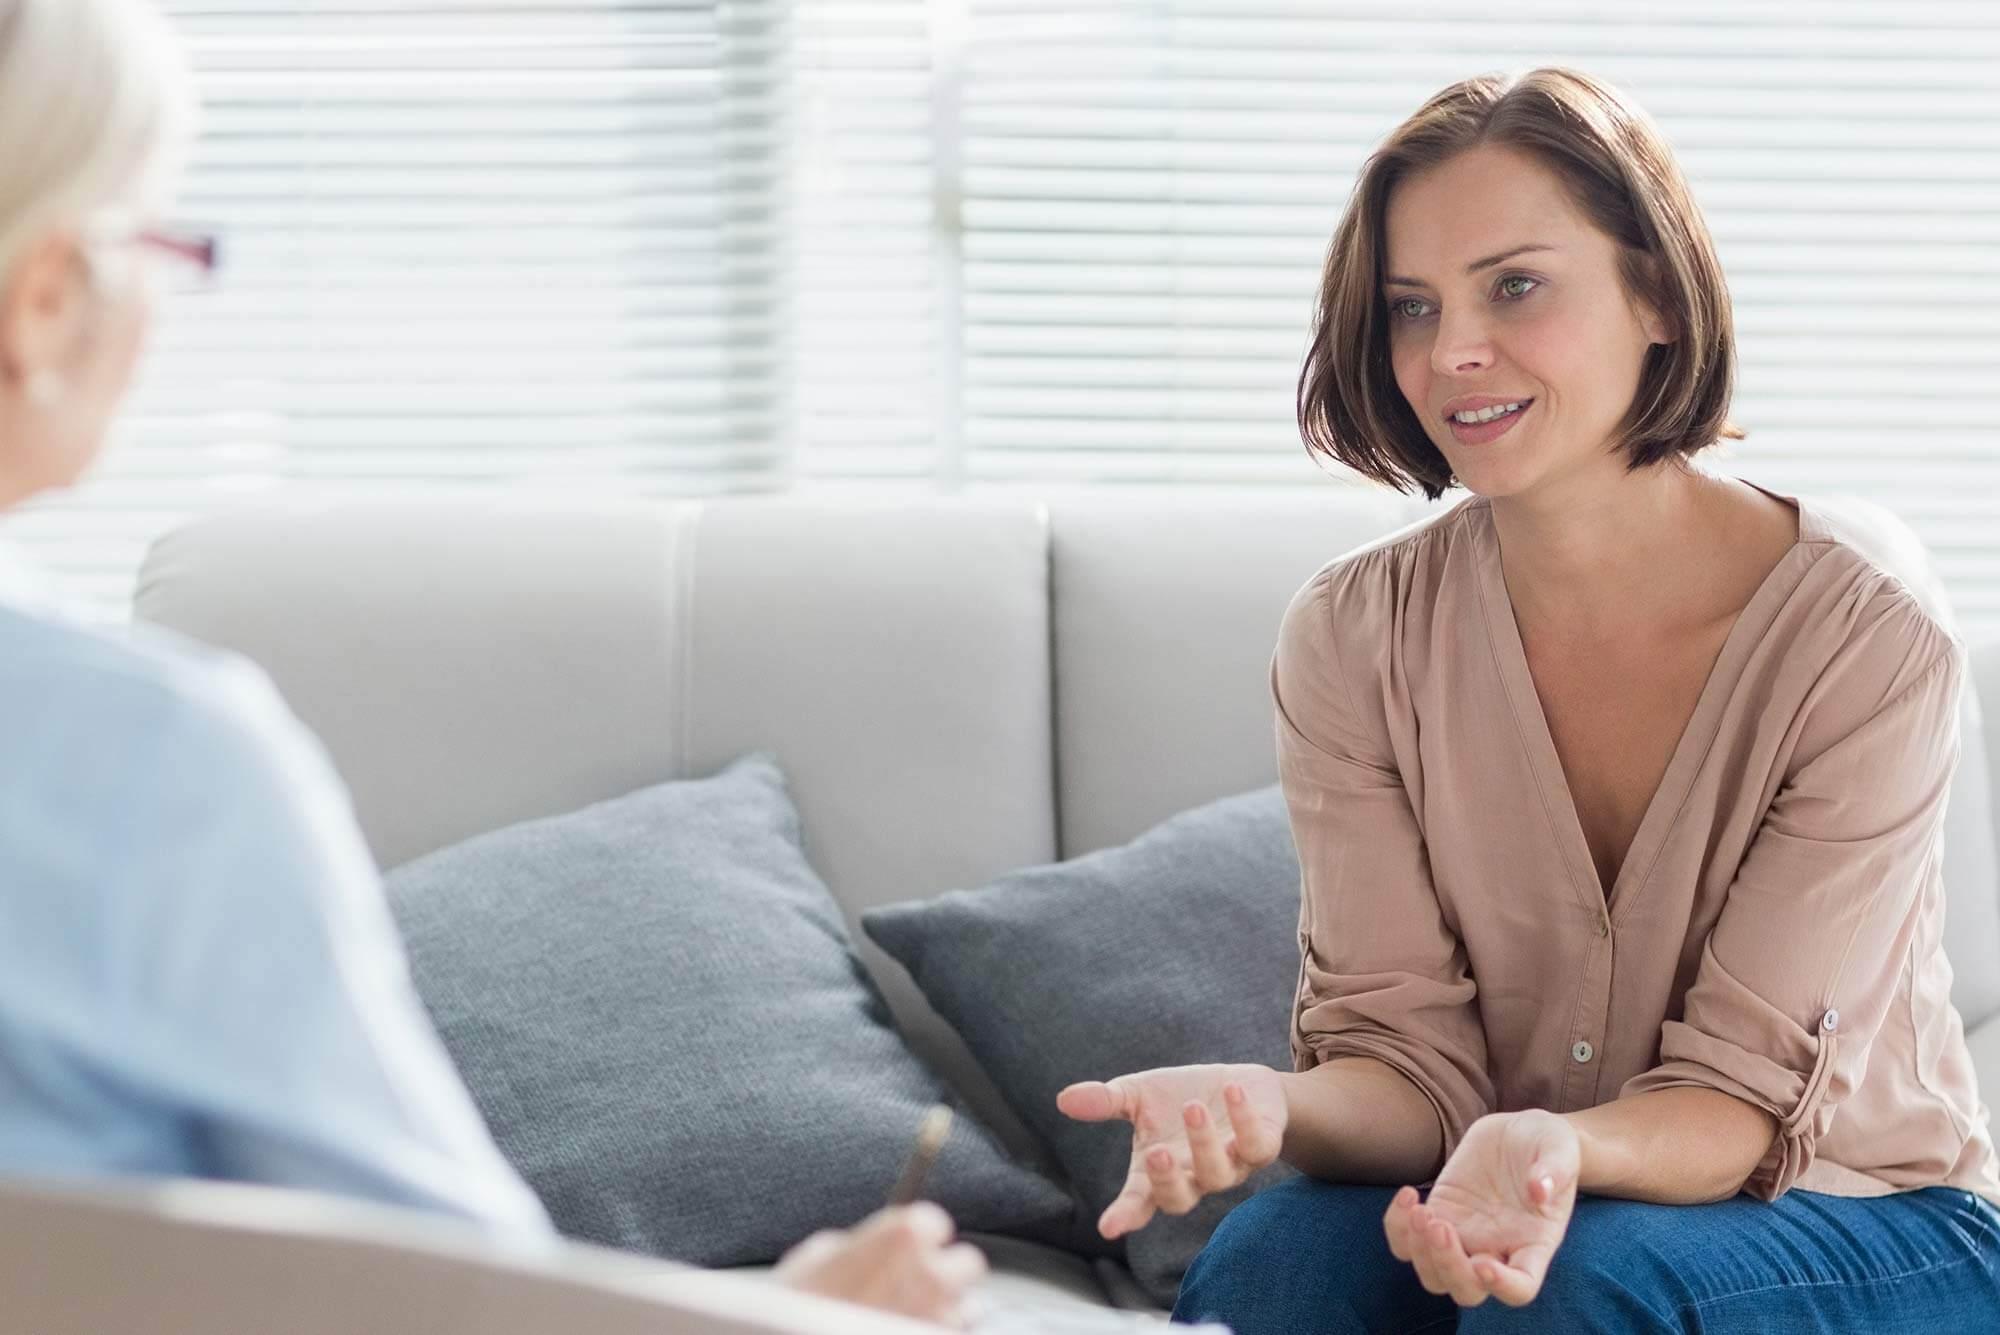 Vrouwen in coachingsgesrprek (Opleidingen)